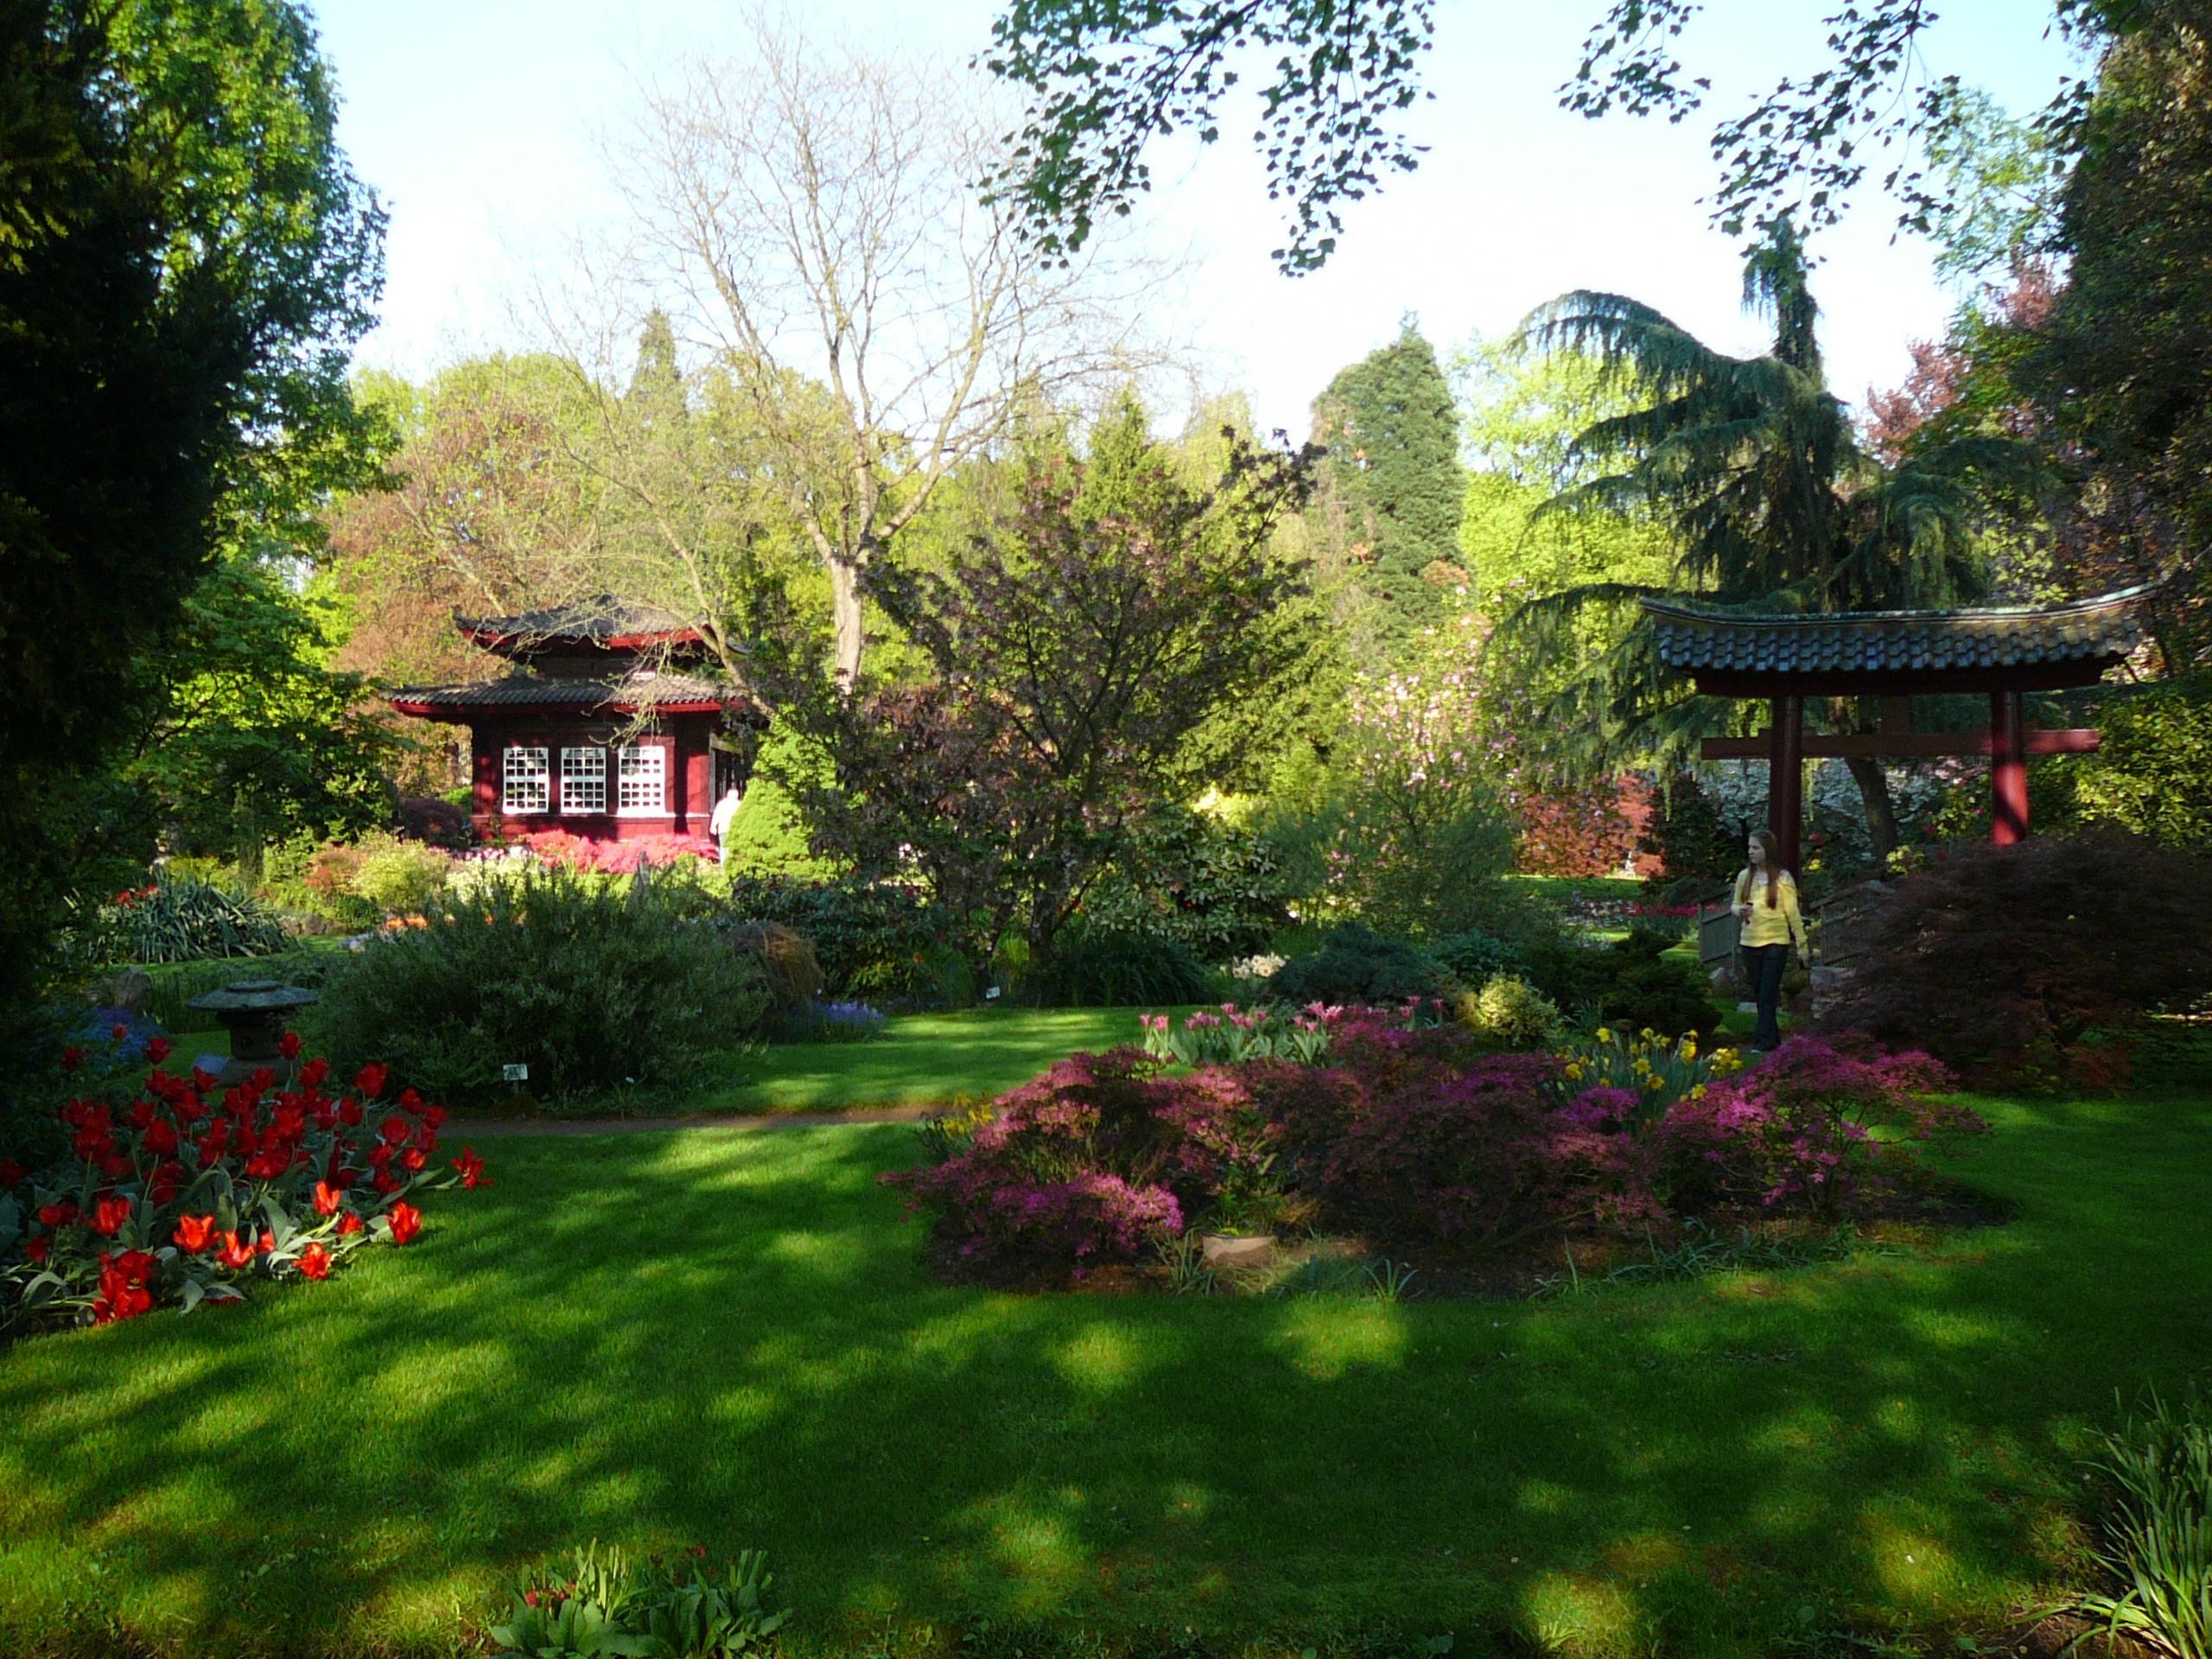 Japanischer Garten Leverkusen Wikipedia